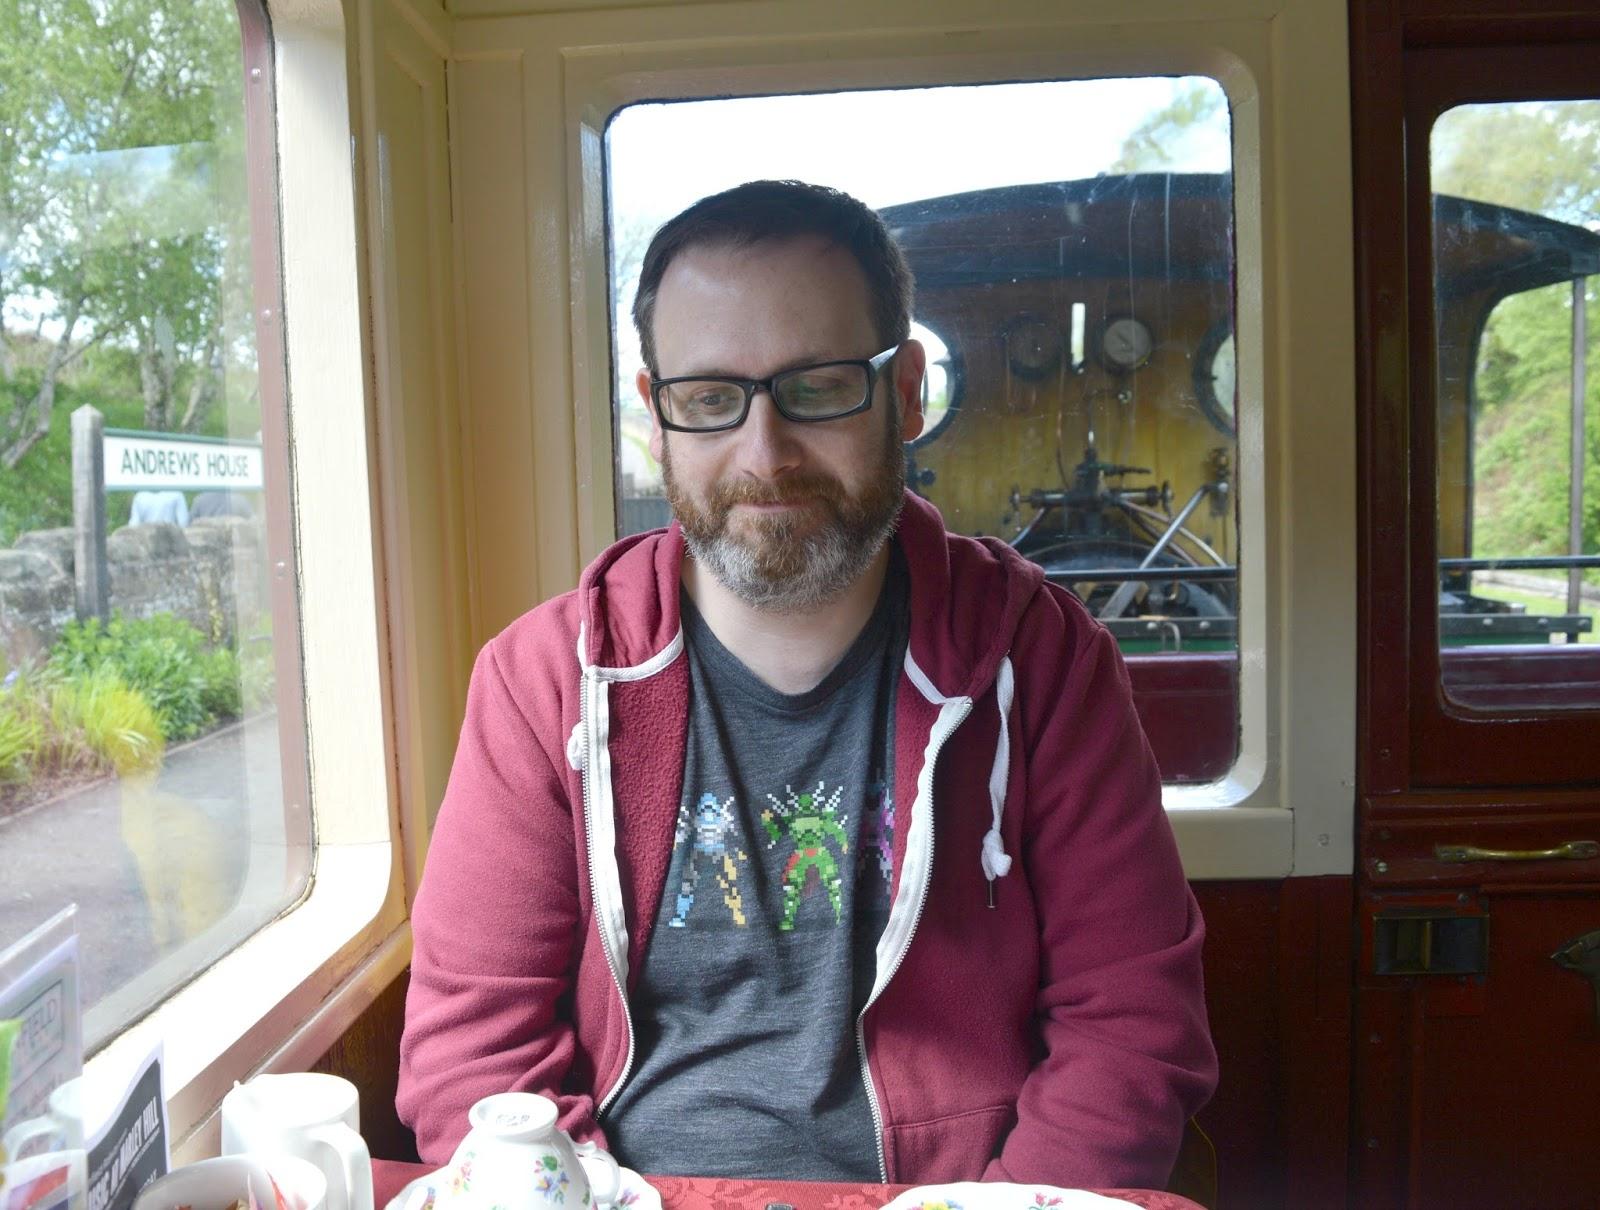 Afternoon Tea Steam Train - Gateshead